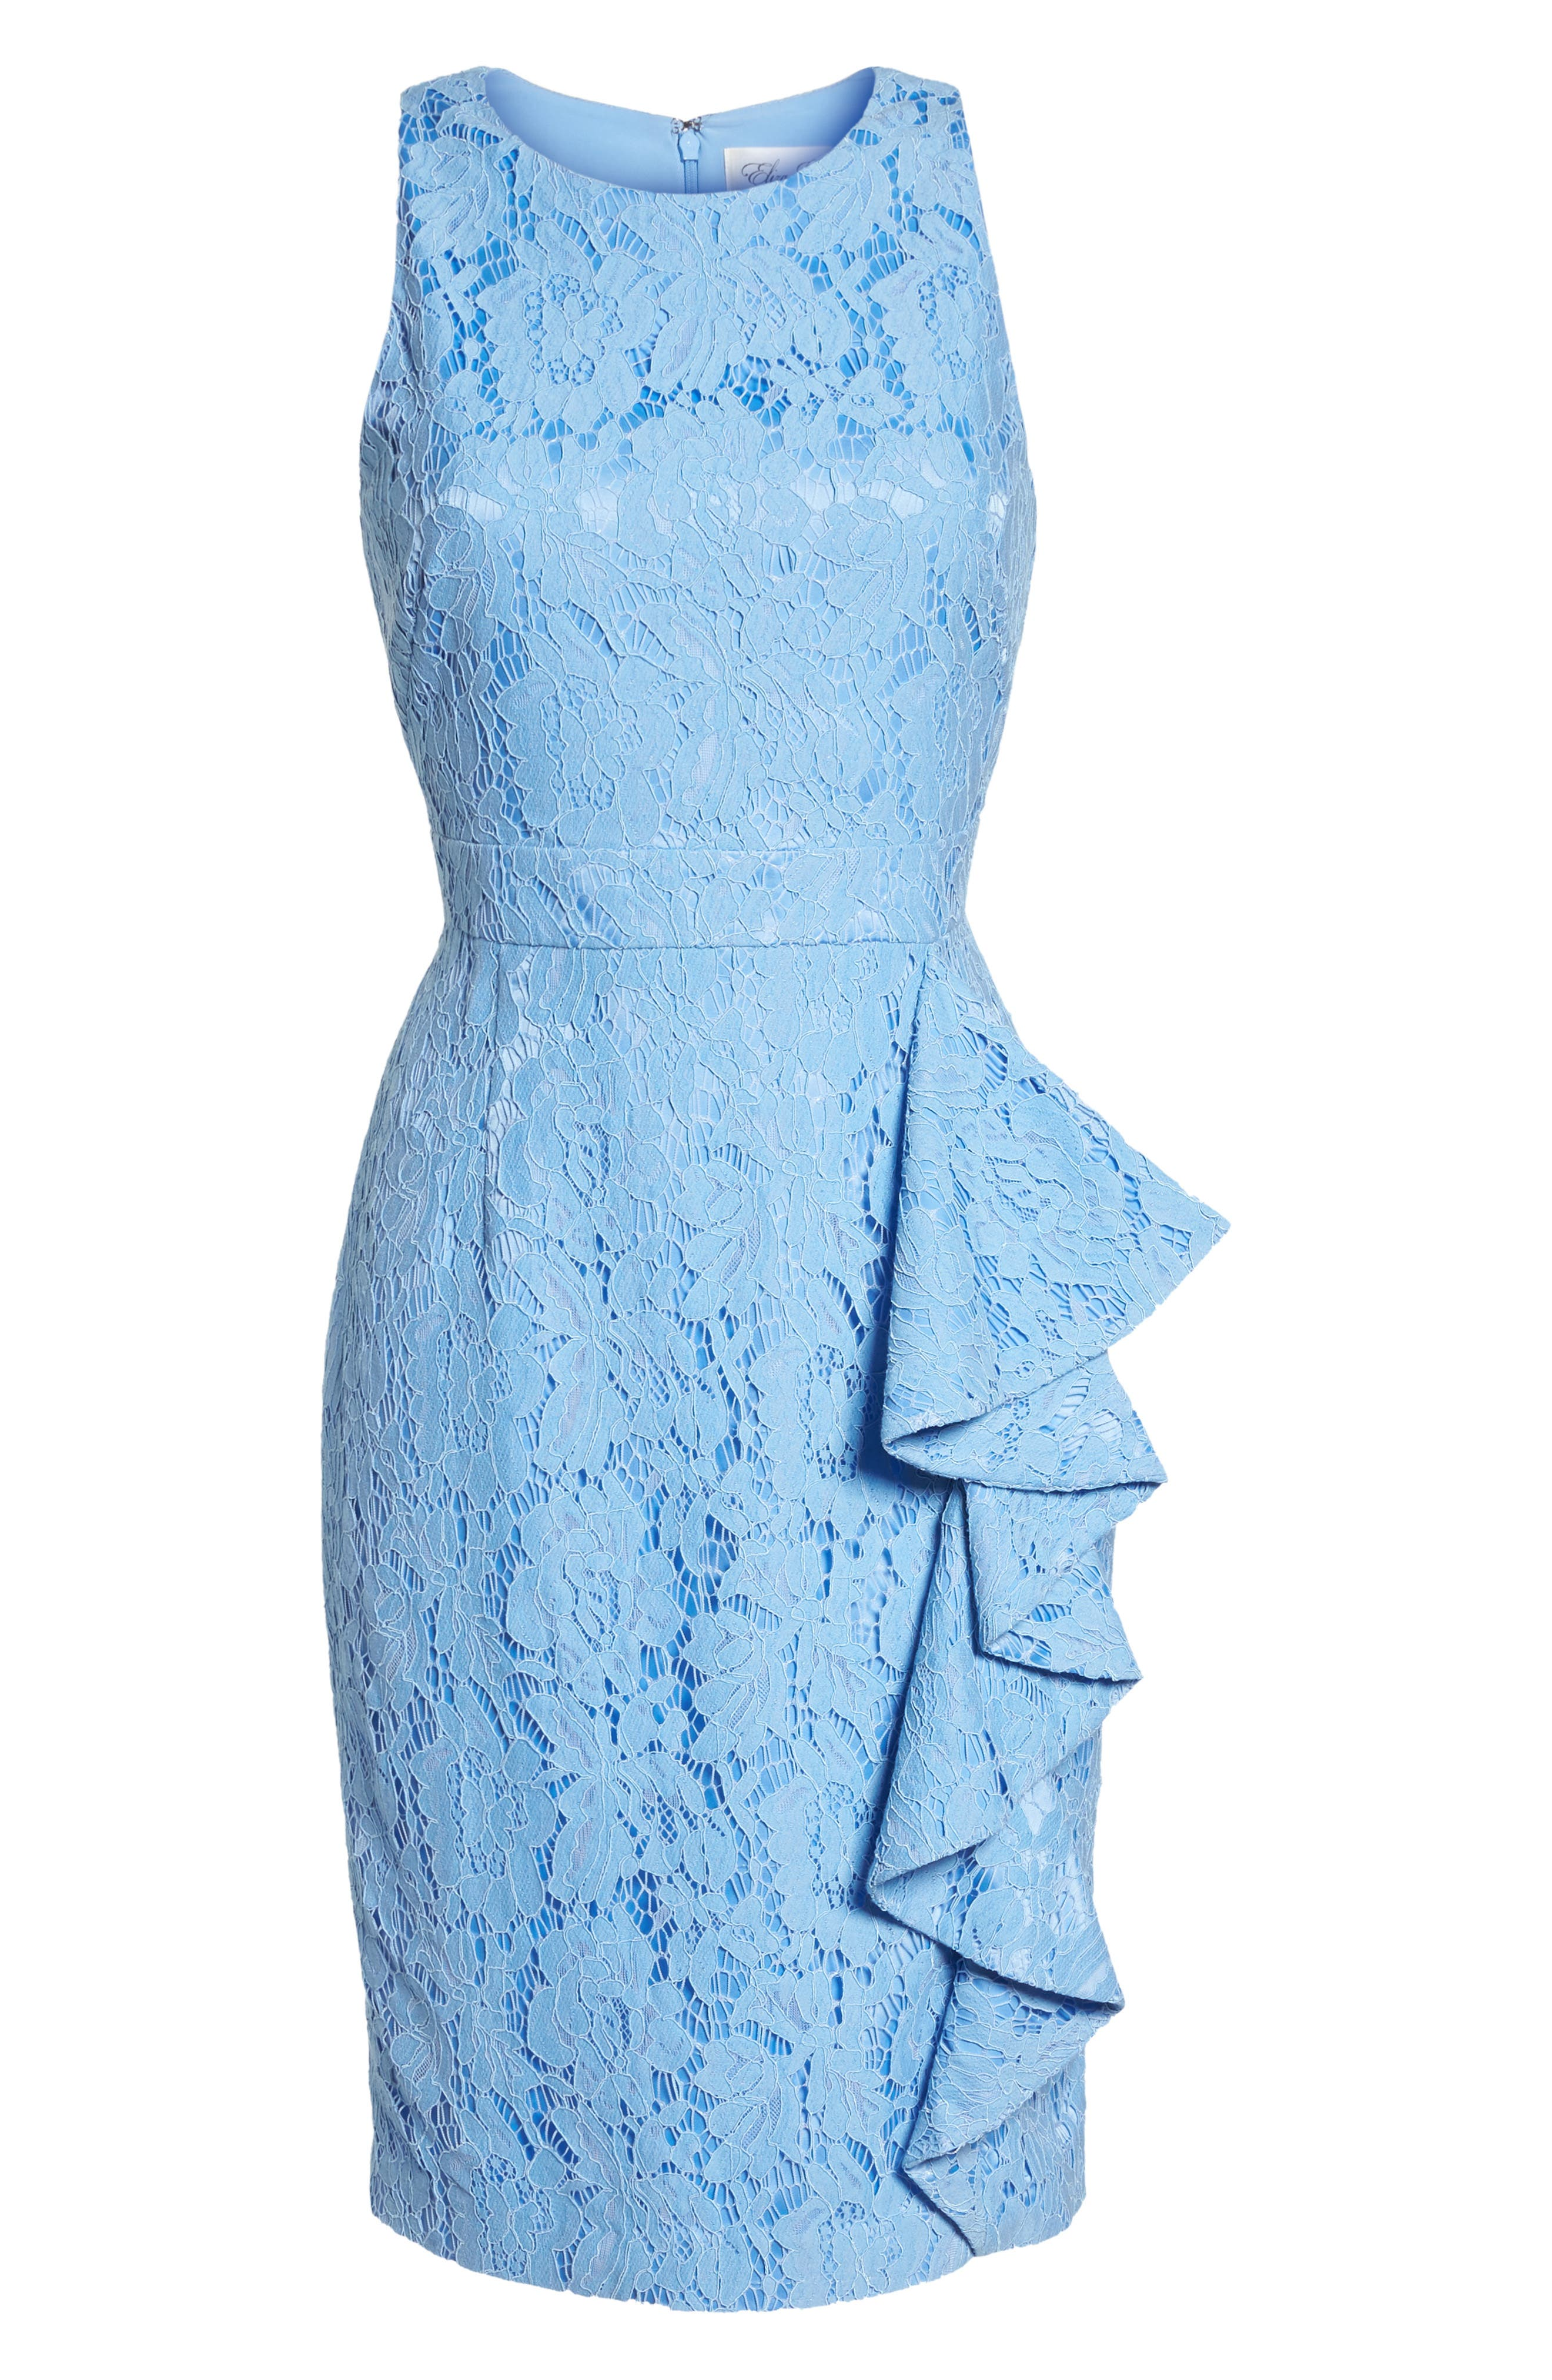 Sleeveless Ruffle Lace Sheath Dress,                             Alternate thumbnail 7, color,                             Blue